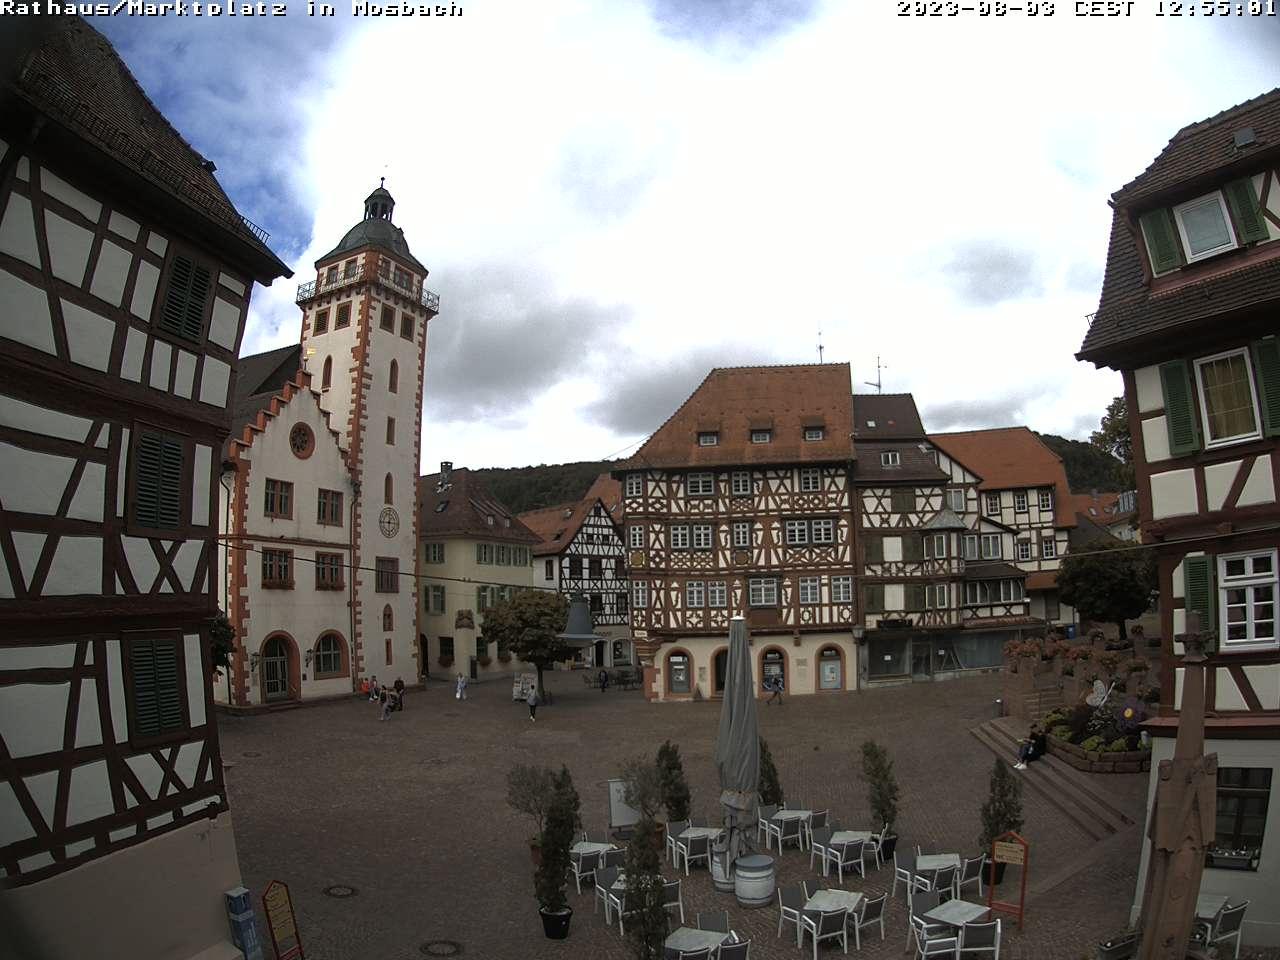 Webcam Mosbacher Marktplatz